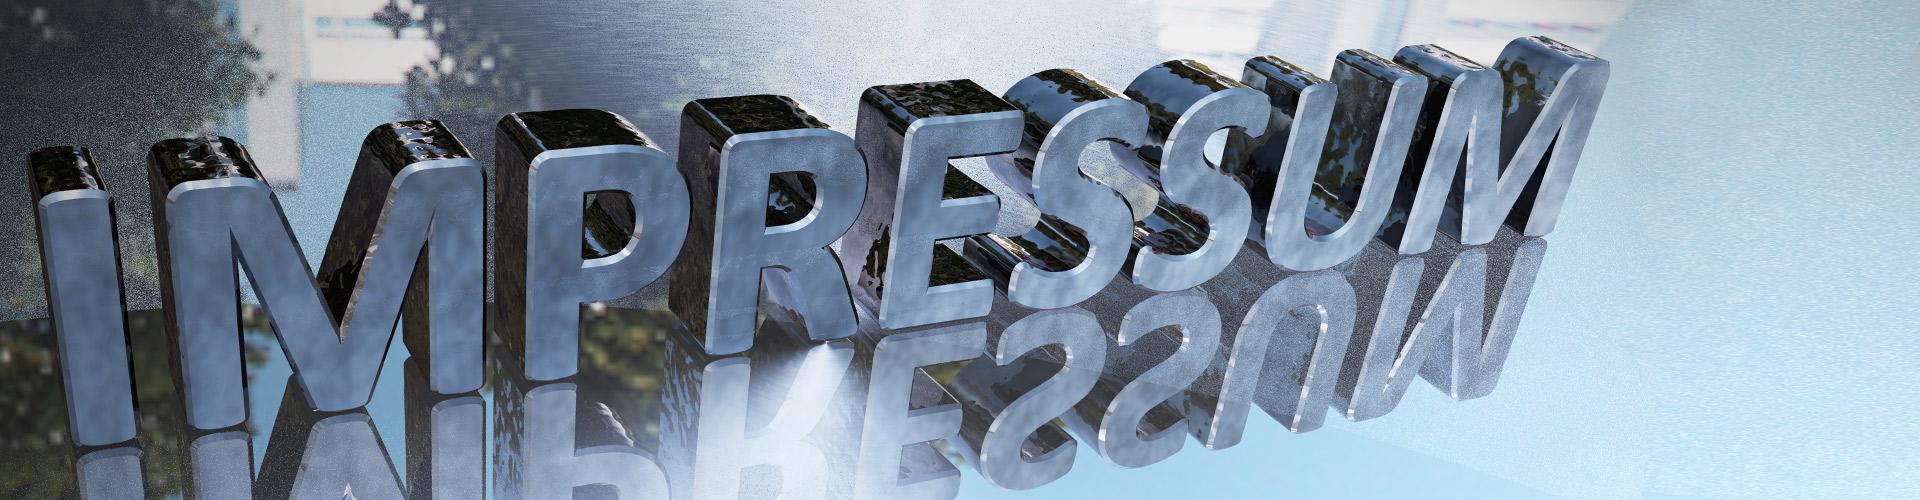 Impressum ASEDO GmbH & Co. KG